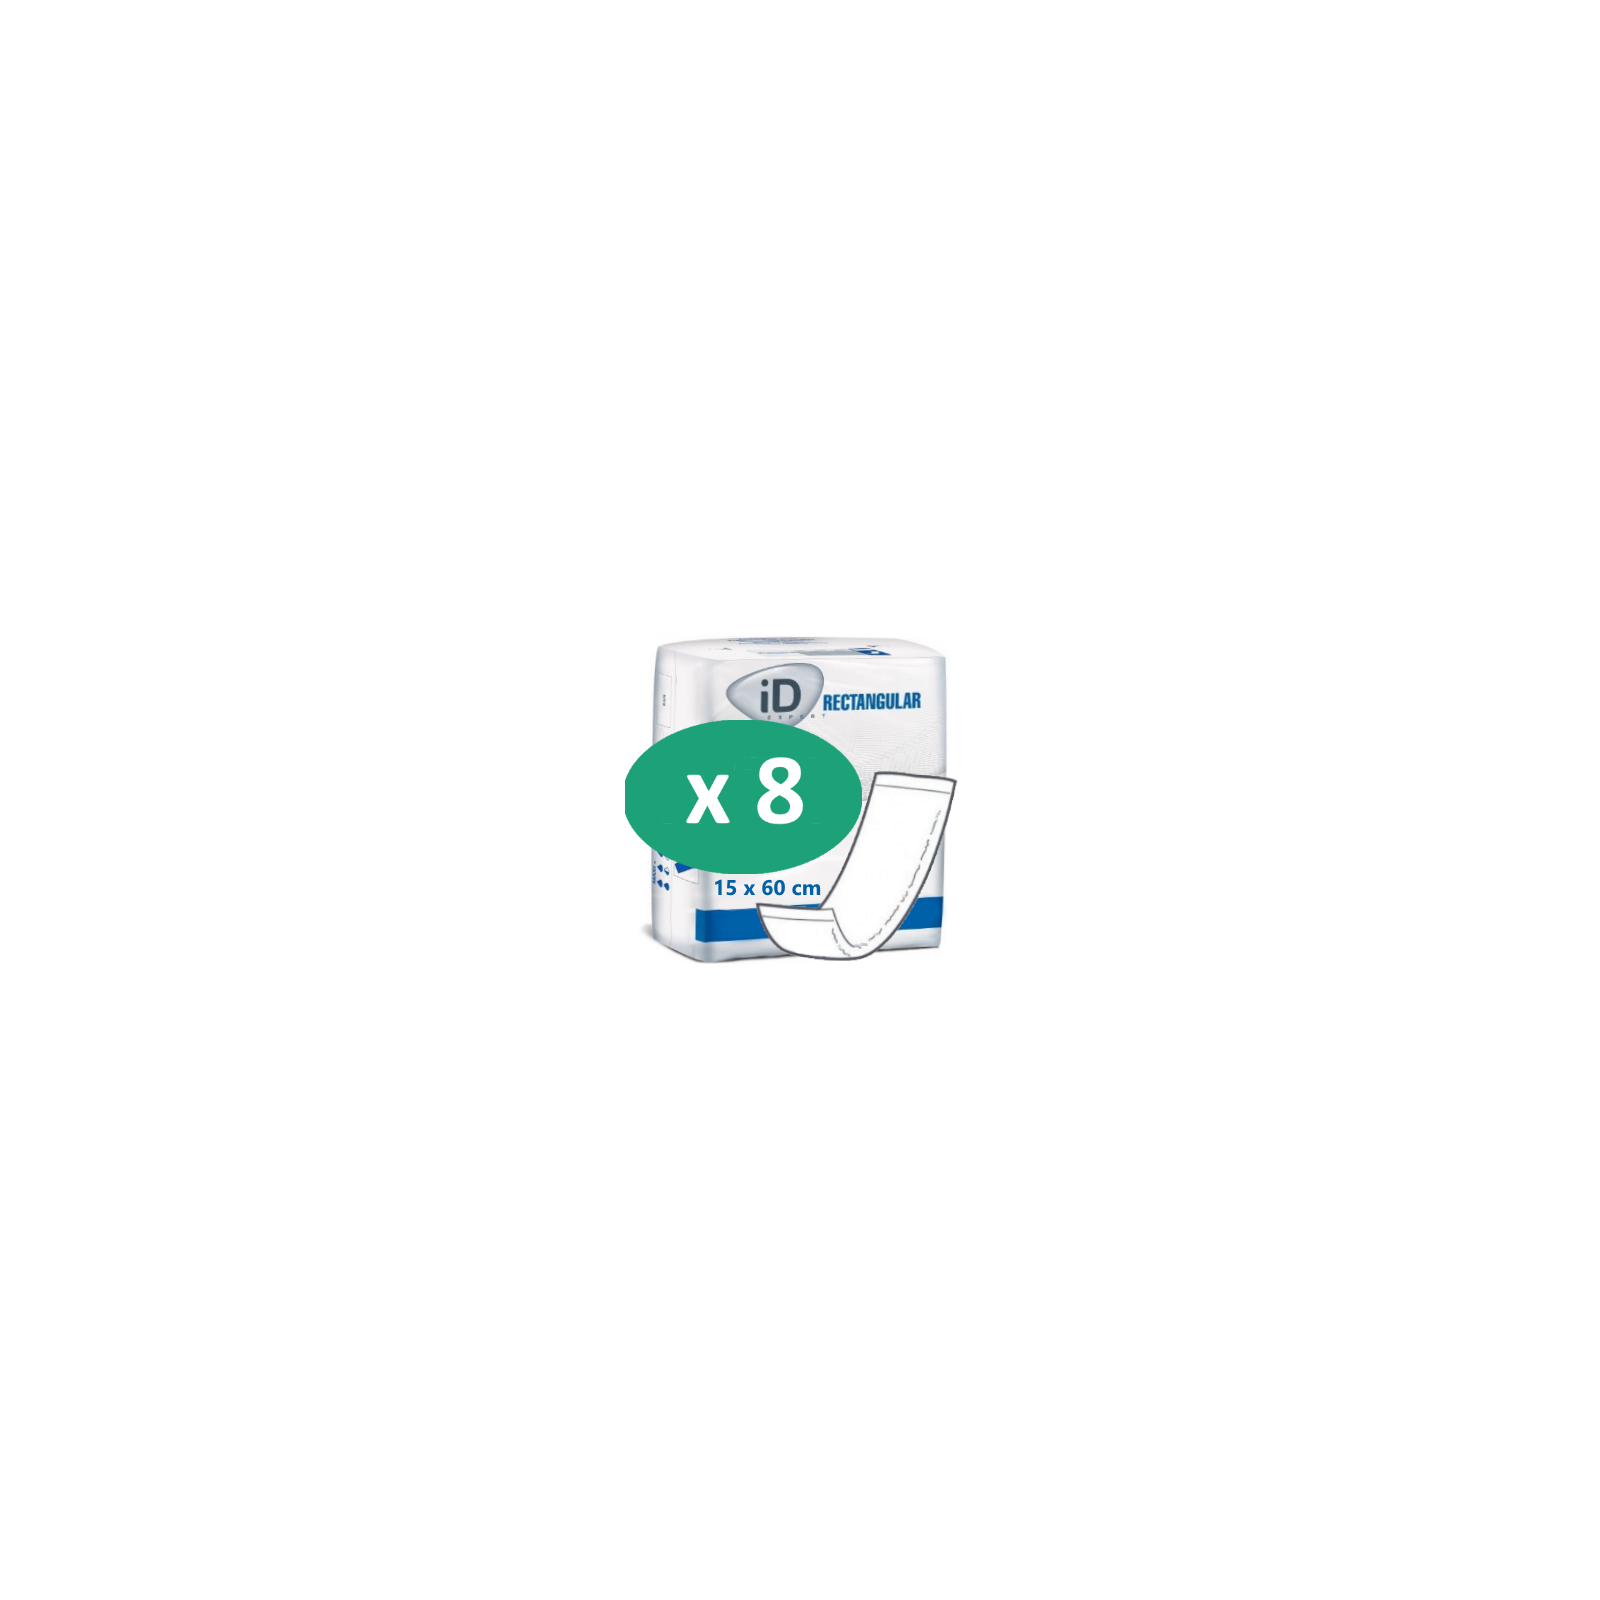 ID Expert Rectangular Intraversable PE 15 x 60 cm| SenUp.com